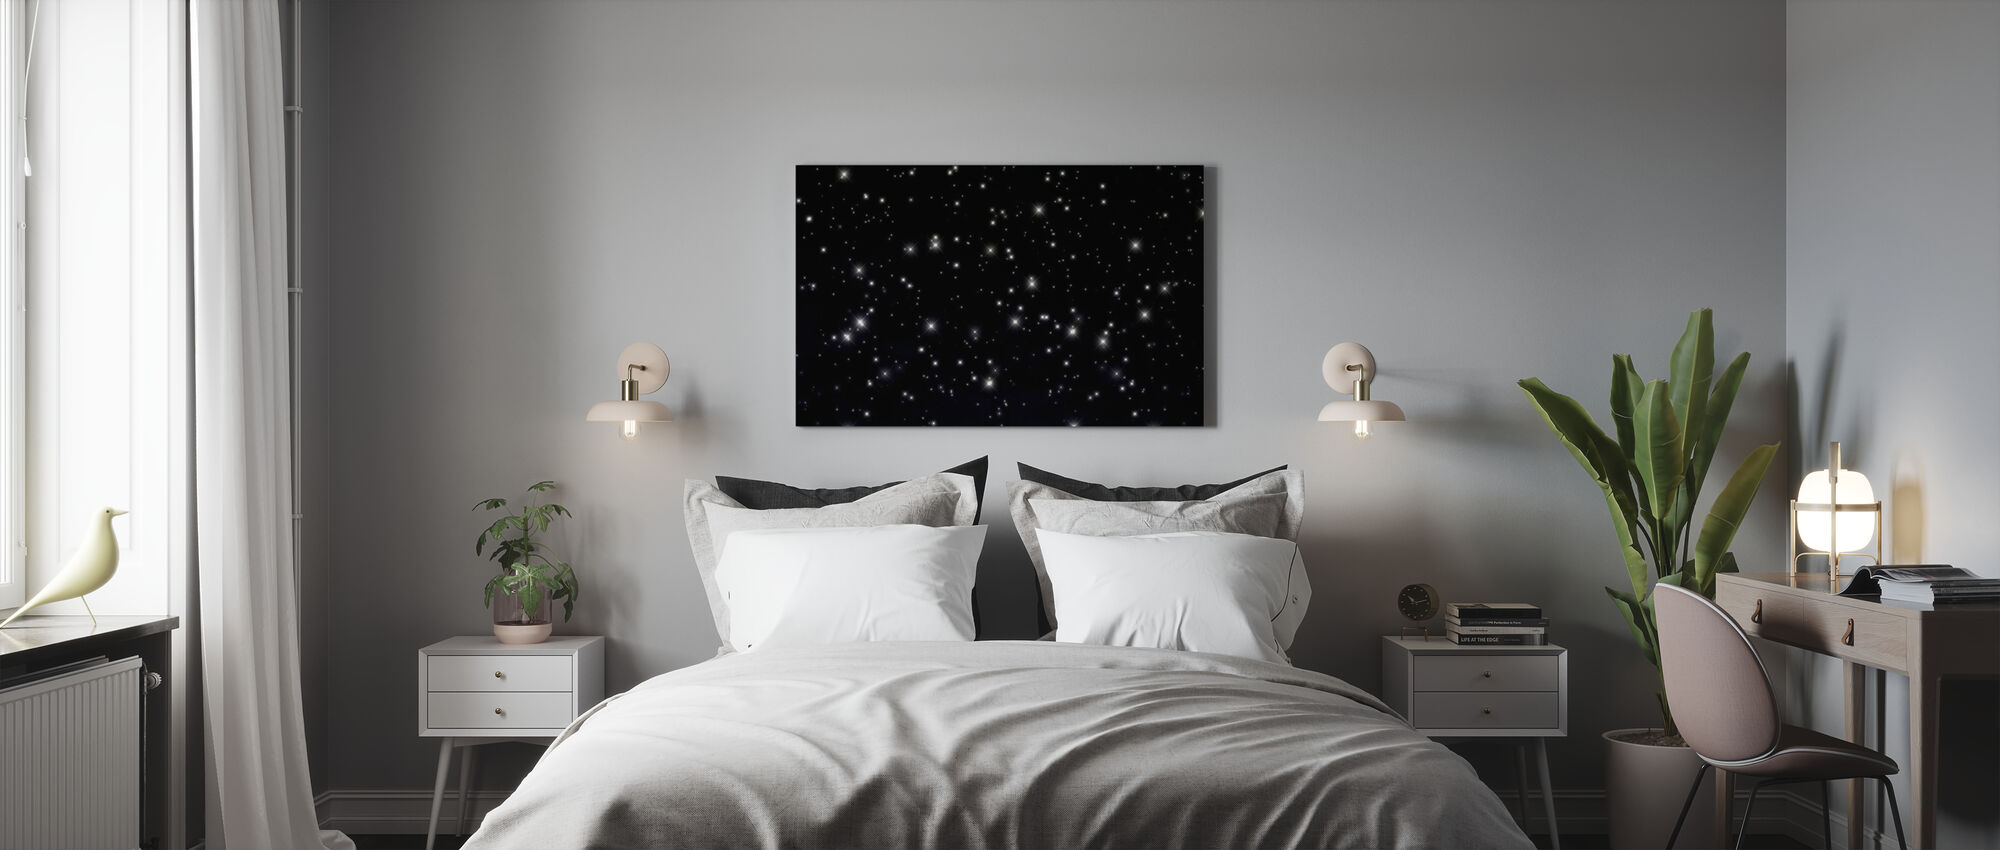 Starry Space - Canvastavla - Sovrum